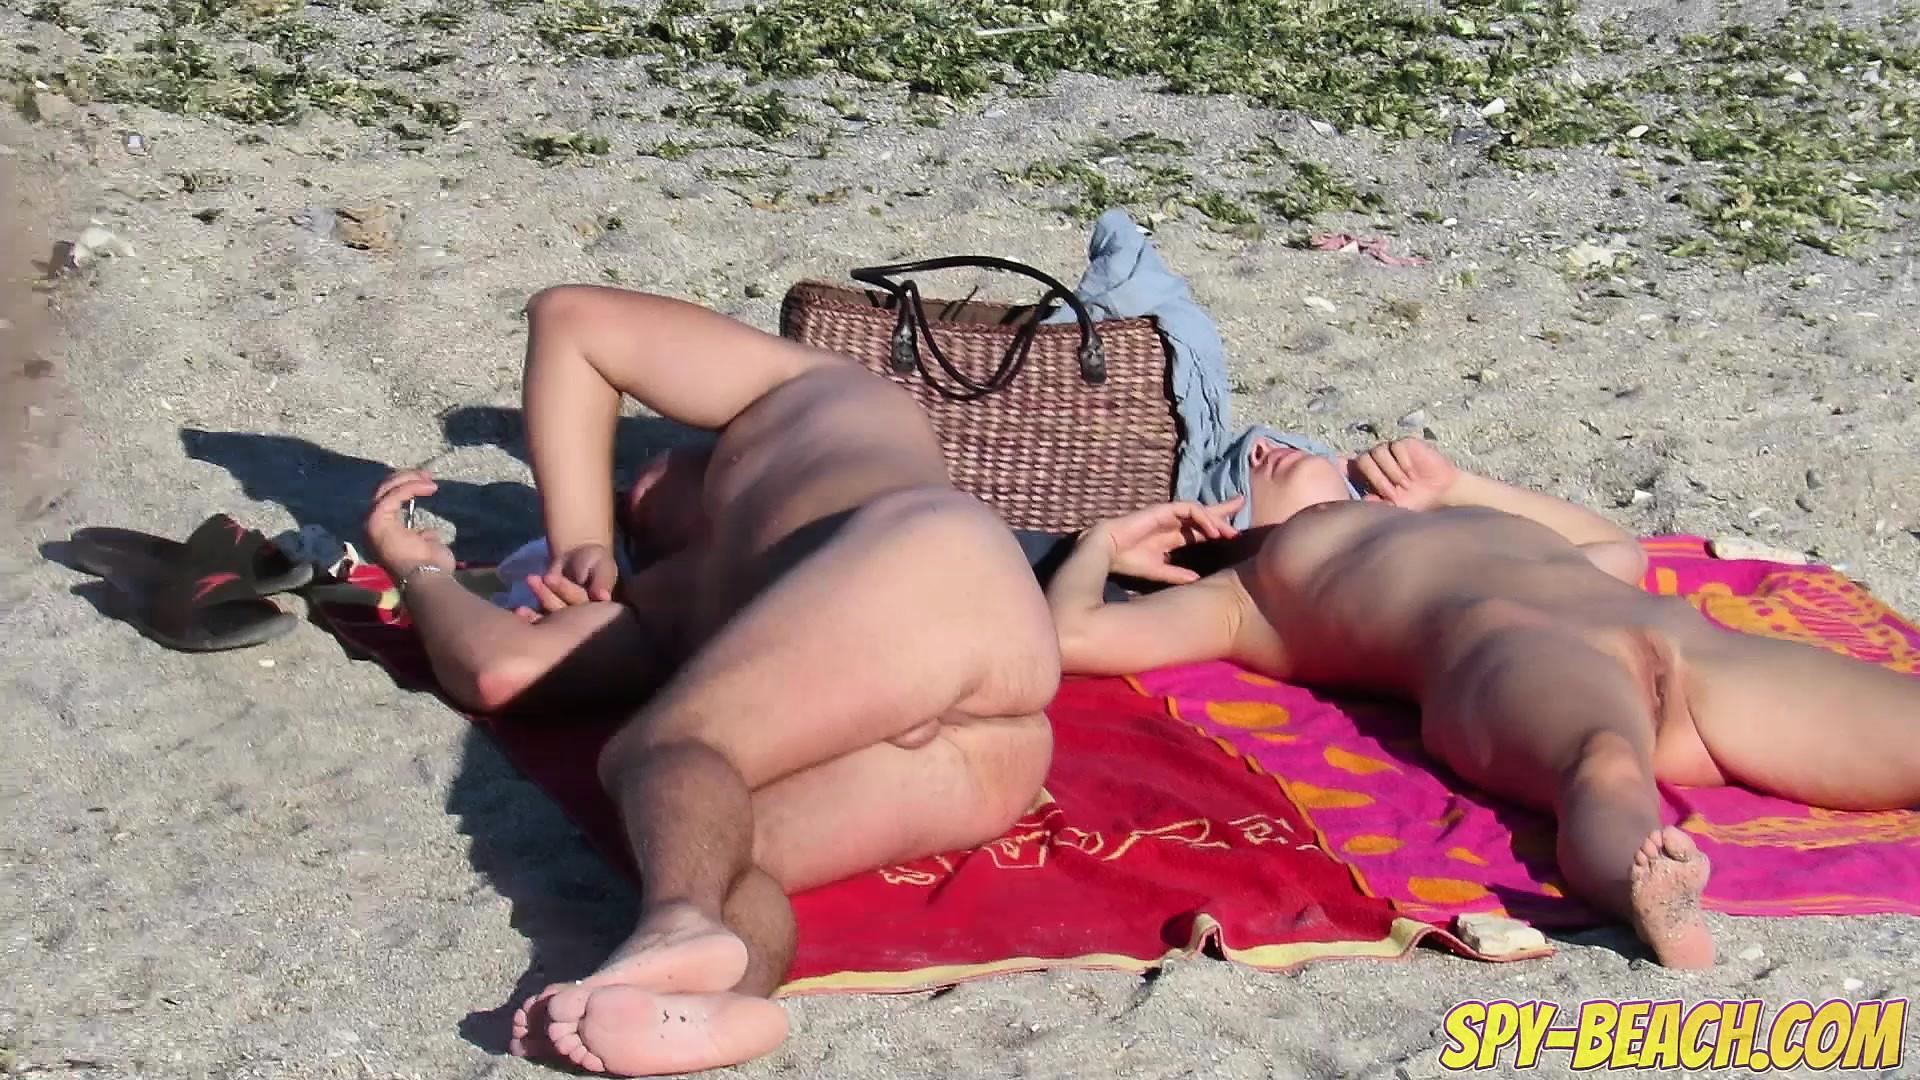 Hd video подгляд на нудистском пляже